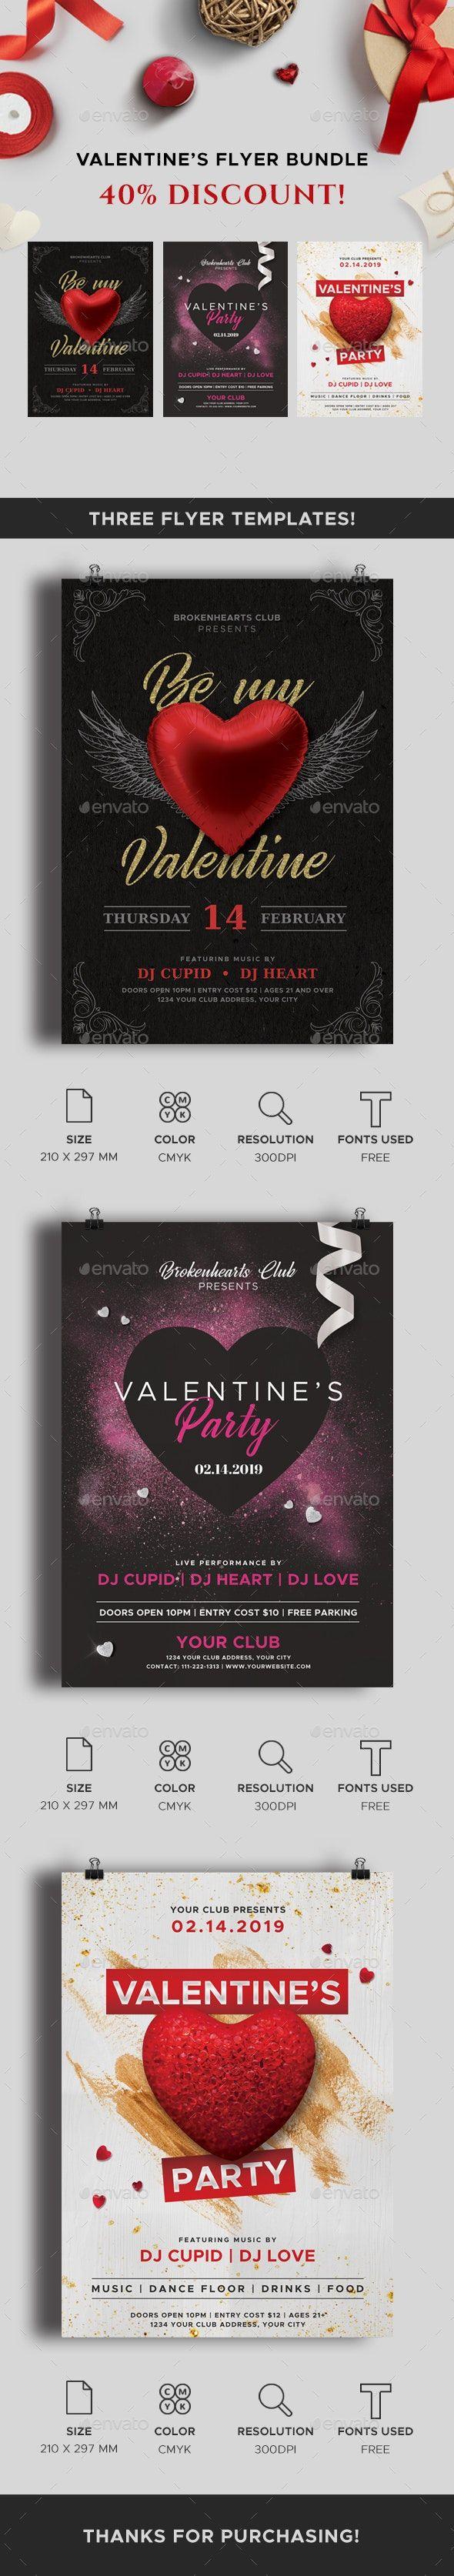 Valentines Day Flyers Bundle